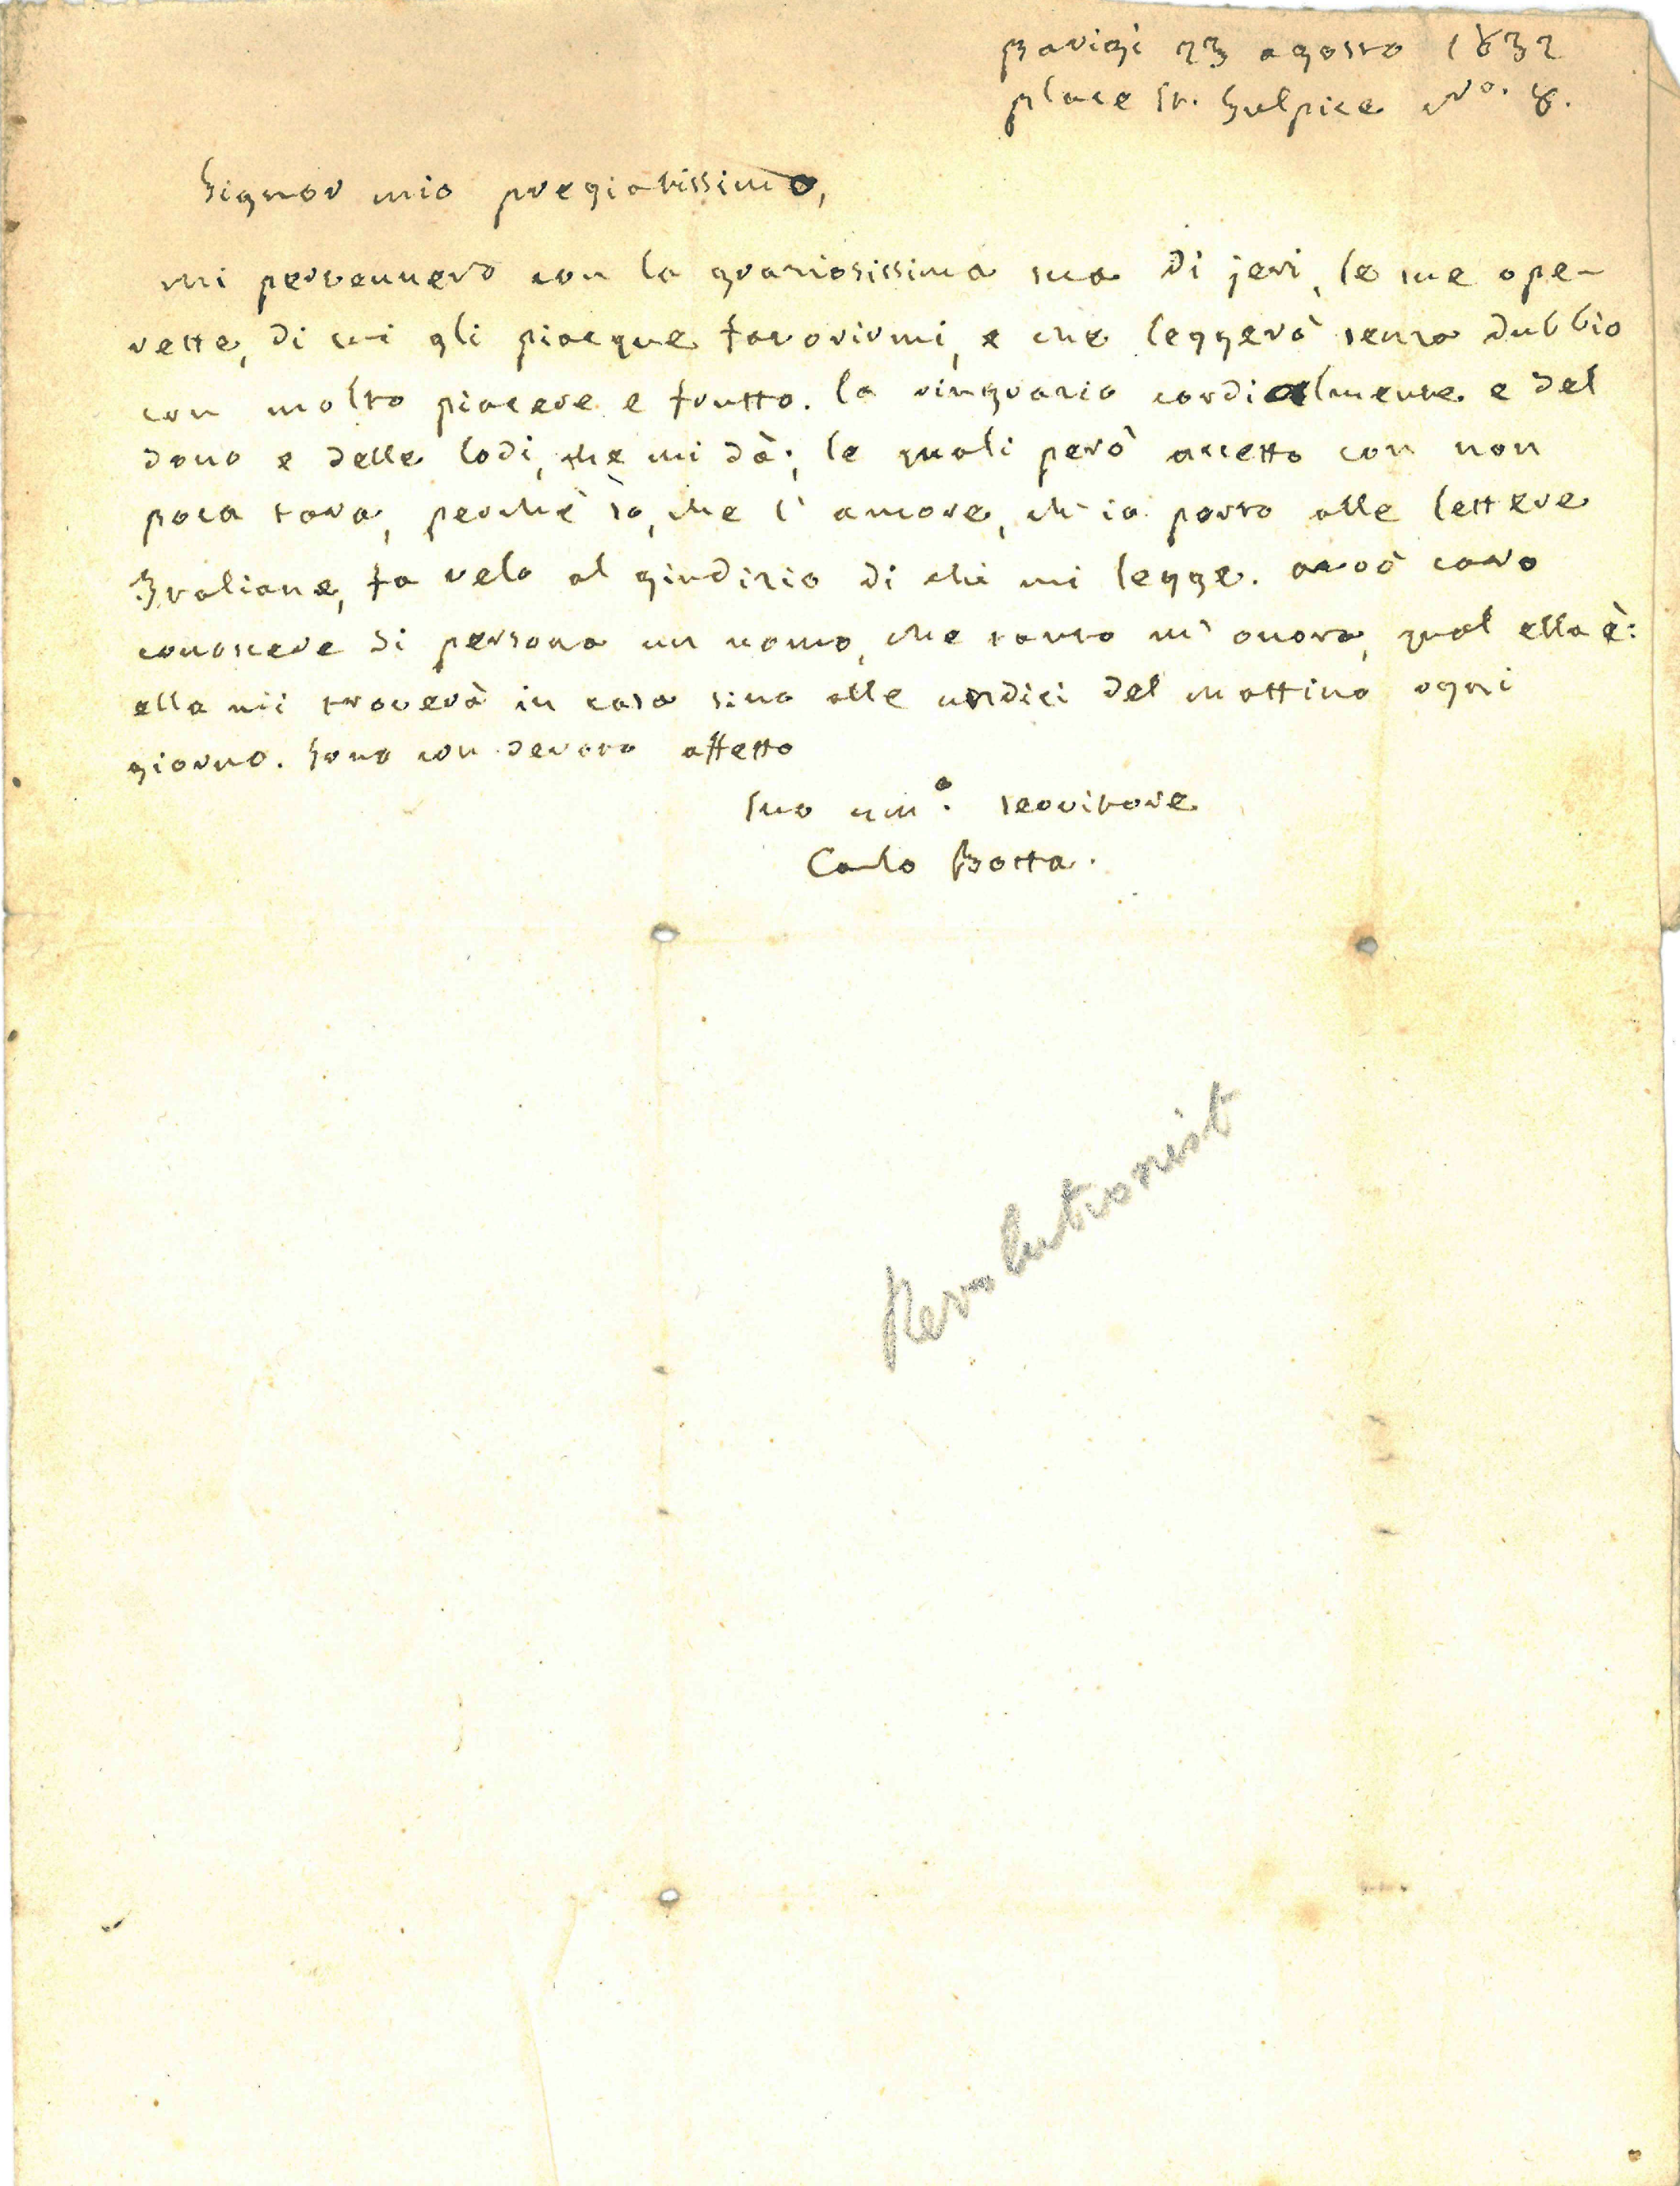 Carlo Giuseppe Guglielmo Botta (1766-1837) to Felix C. Albites (?-?) Paris, 23 August, 1832